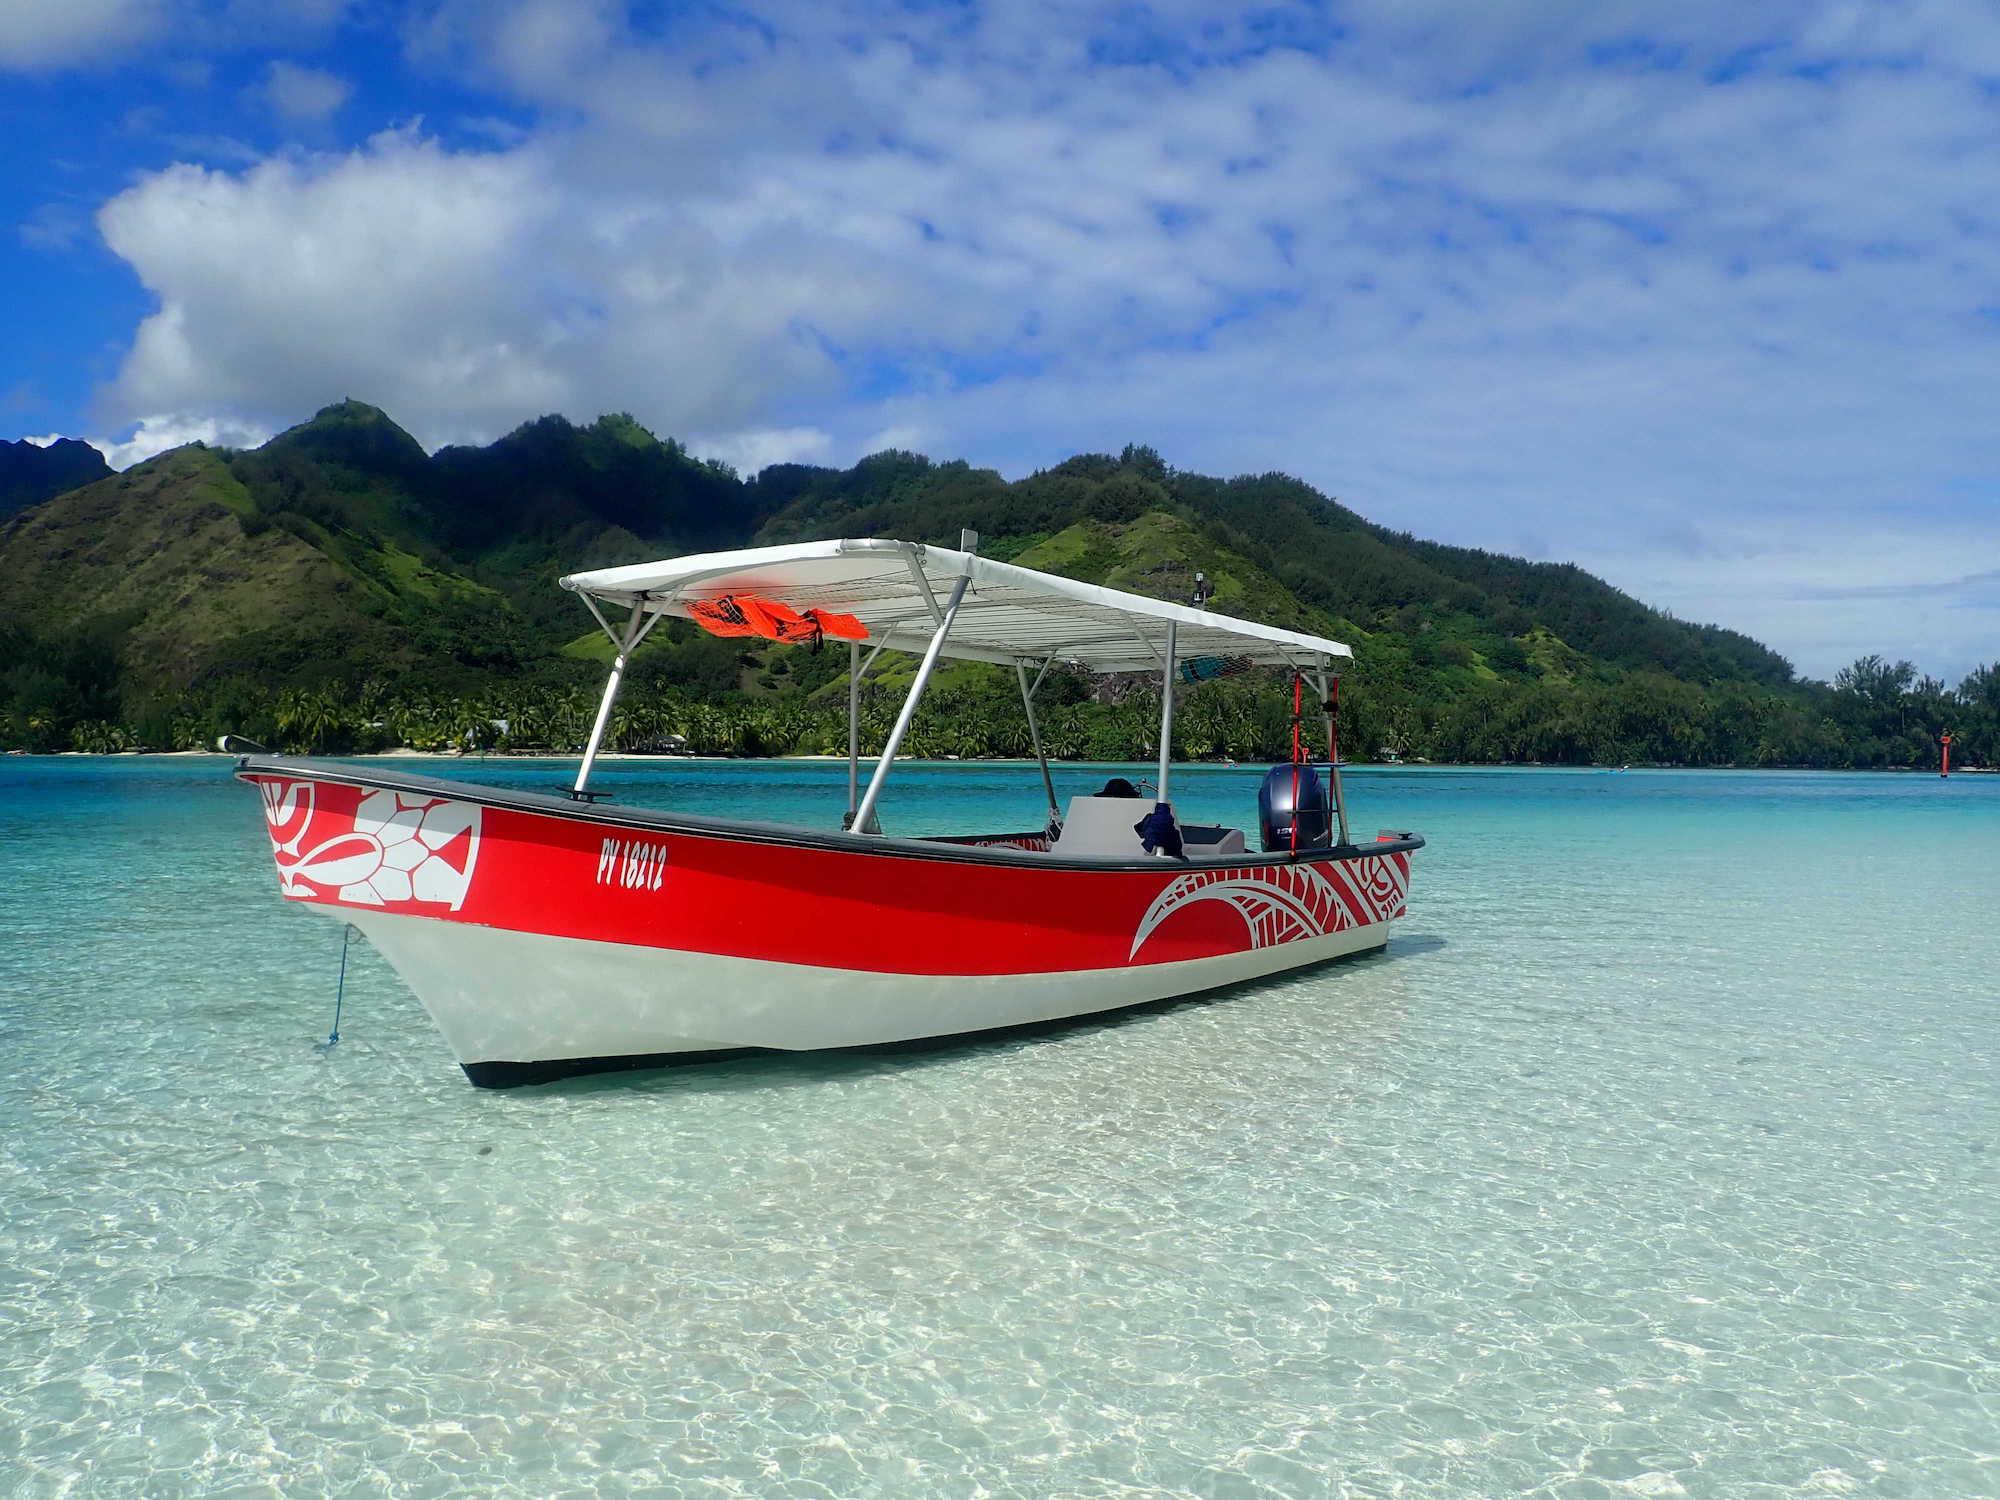 https://tahititourisme.com.br/wp-content/uploads/2020/09/Boat-Hinaloa.jpg